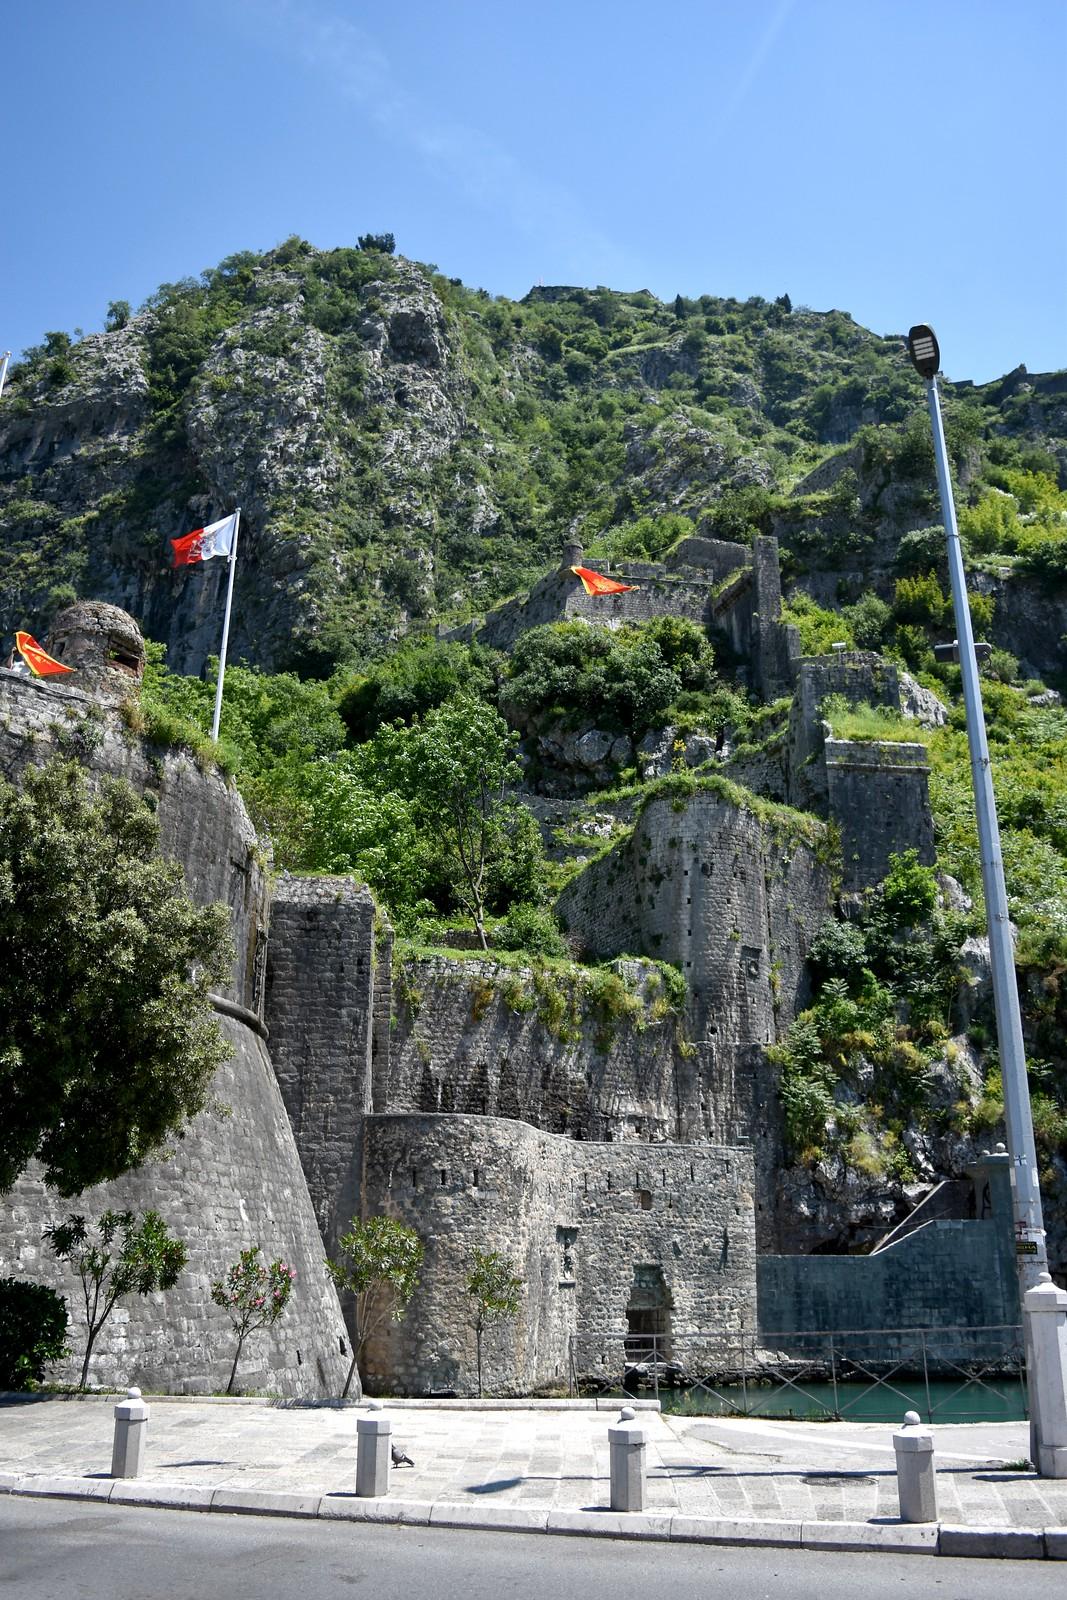 Kotor medieval walls